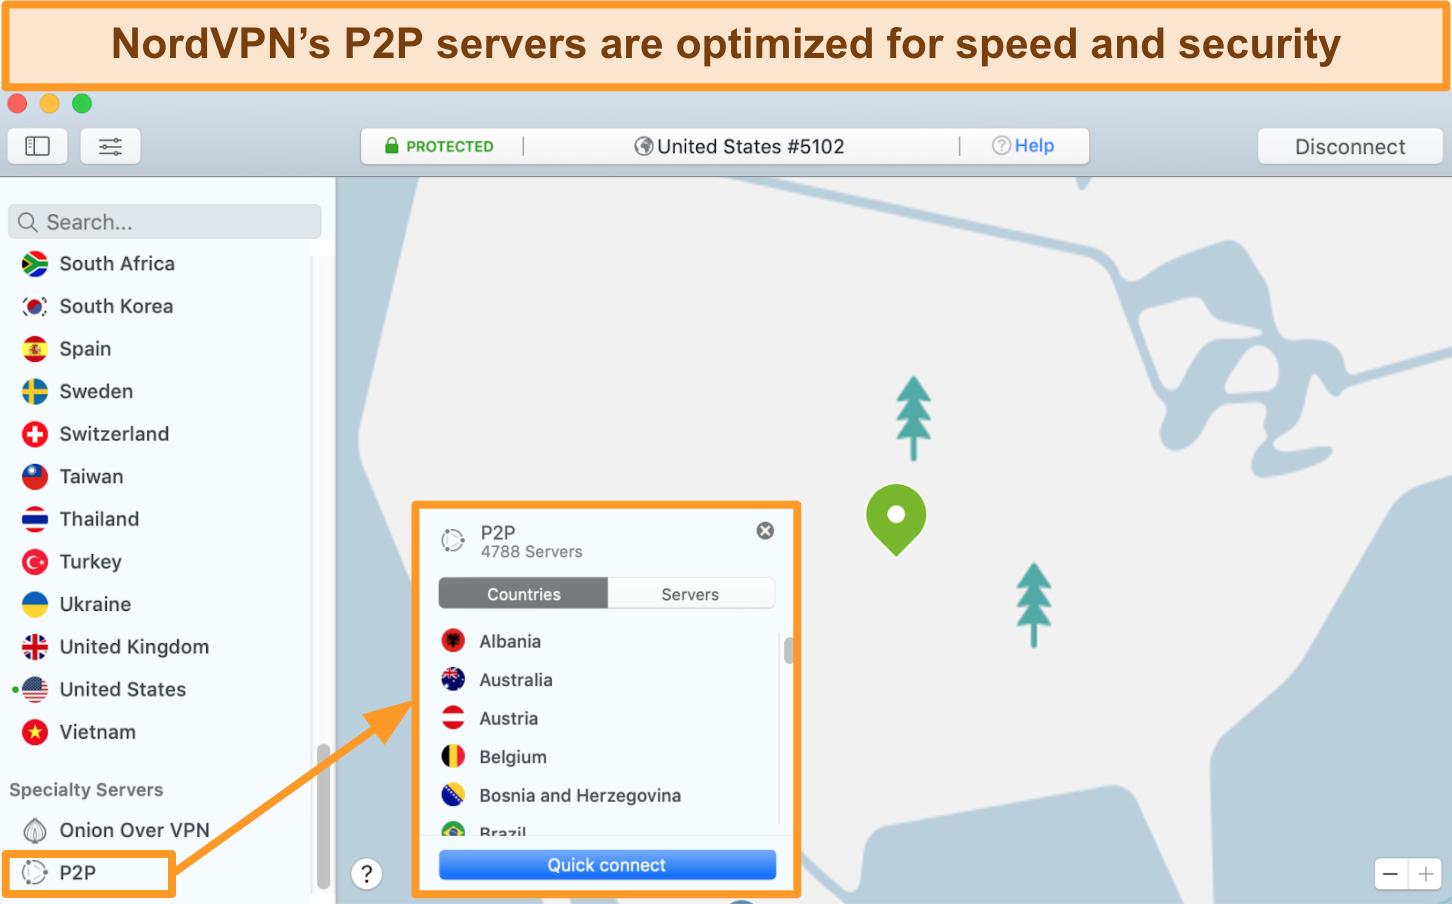 Screenshot of NordVPN's P2P servers for torrenting on the Mac app